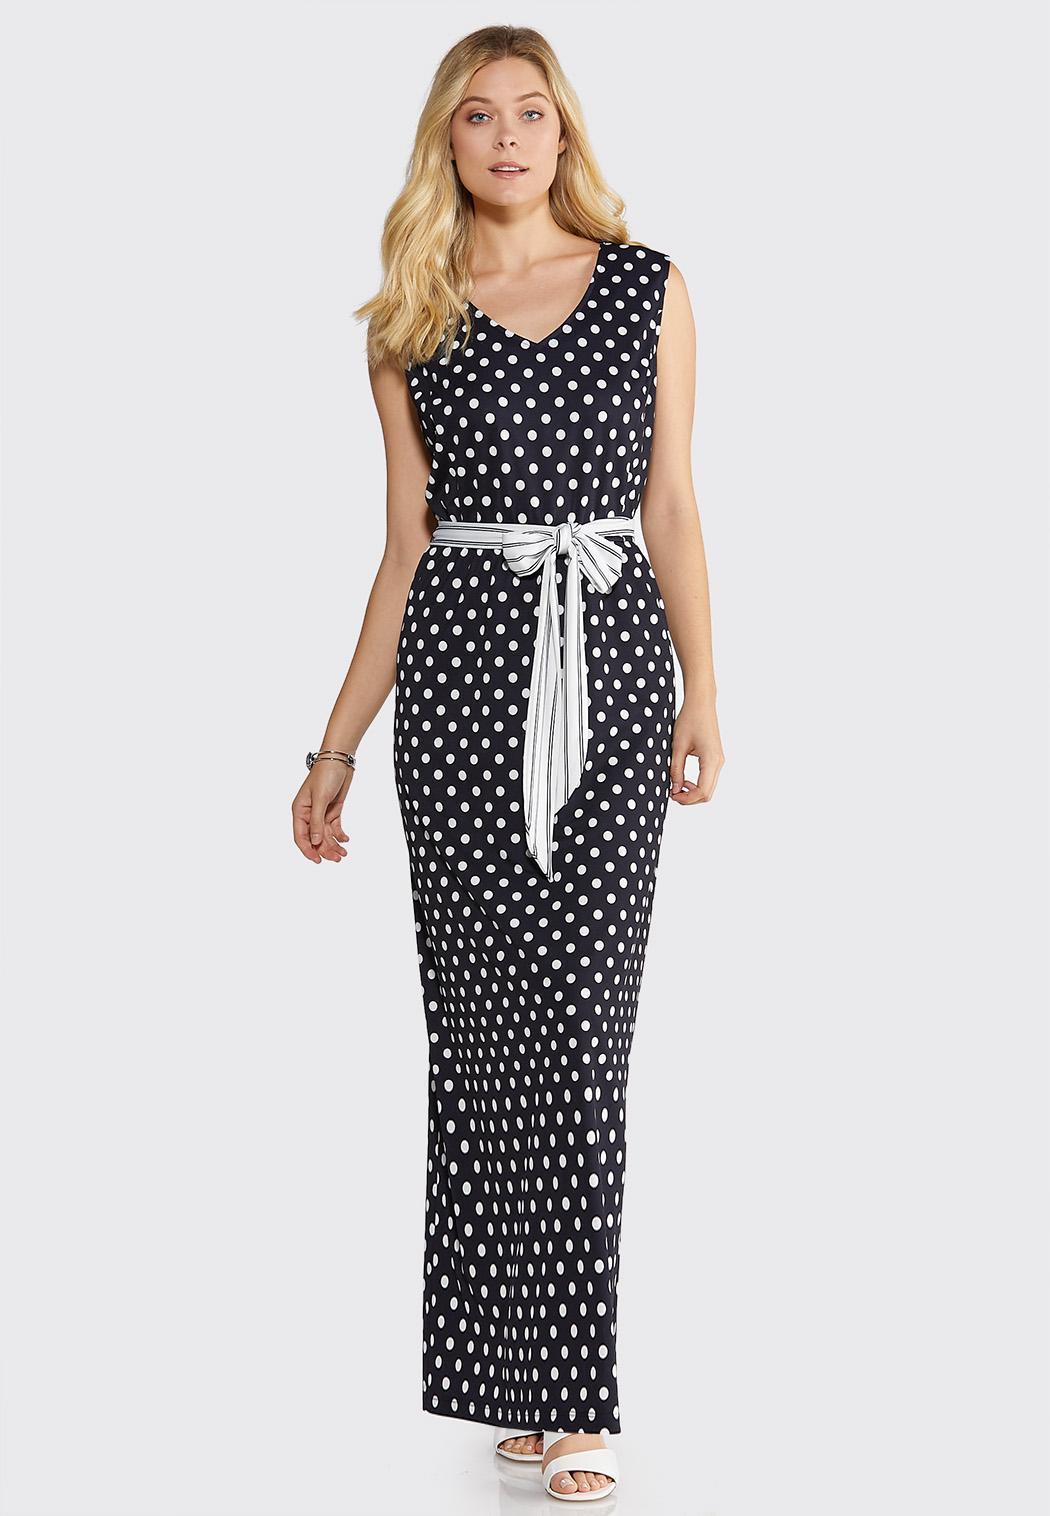 Plus Size Navy Dot Print Maxi Dress Maxi Cato Fashions